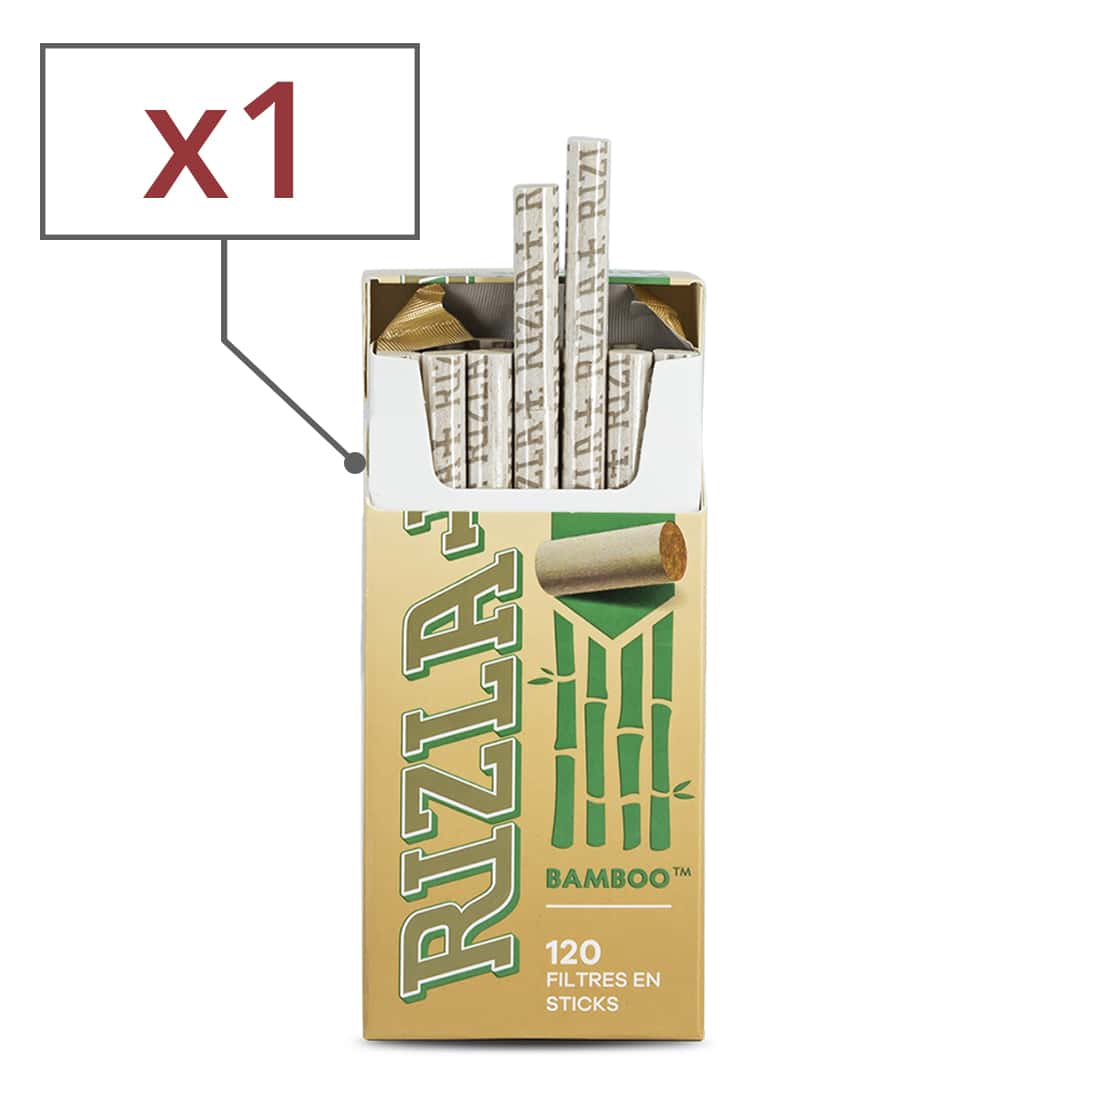 Photo de Filtres Rizla + Ultra Slim en sticks Bamboo x 1 Boite